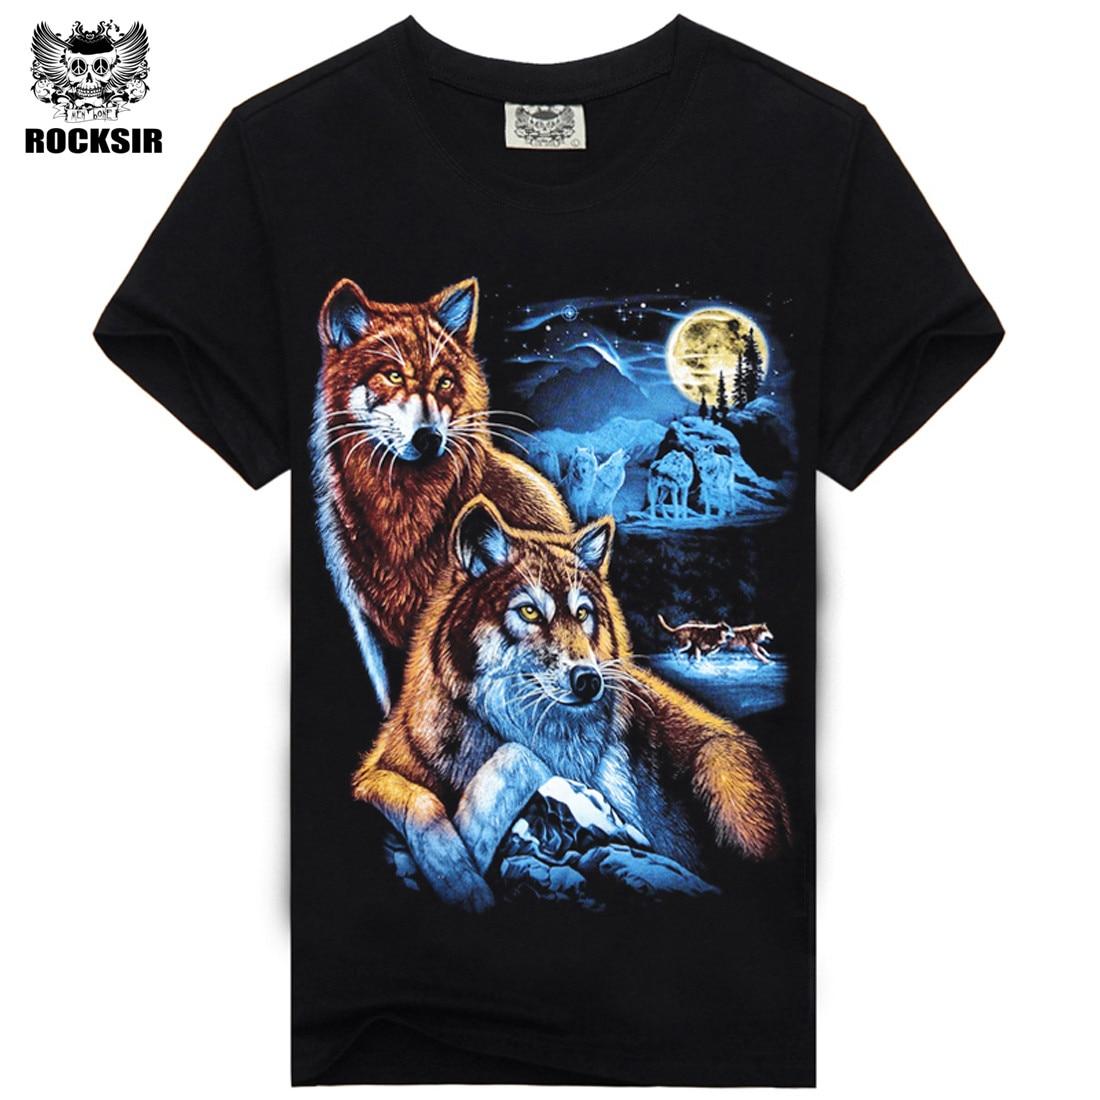 Rocksir 3d wolf t shirt mens Brand 3D Indians wolf Print t shirts Cotton wolves Men t-shirt Casual Man Tees Mens Tops 13